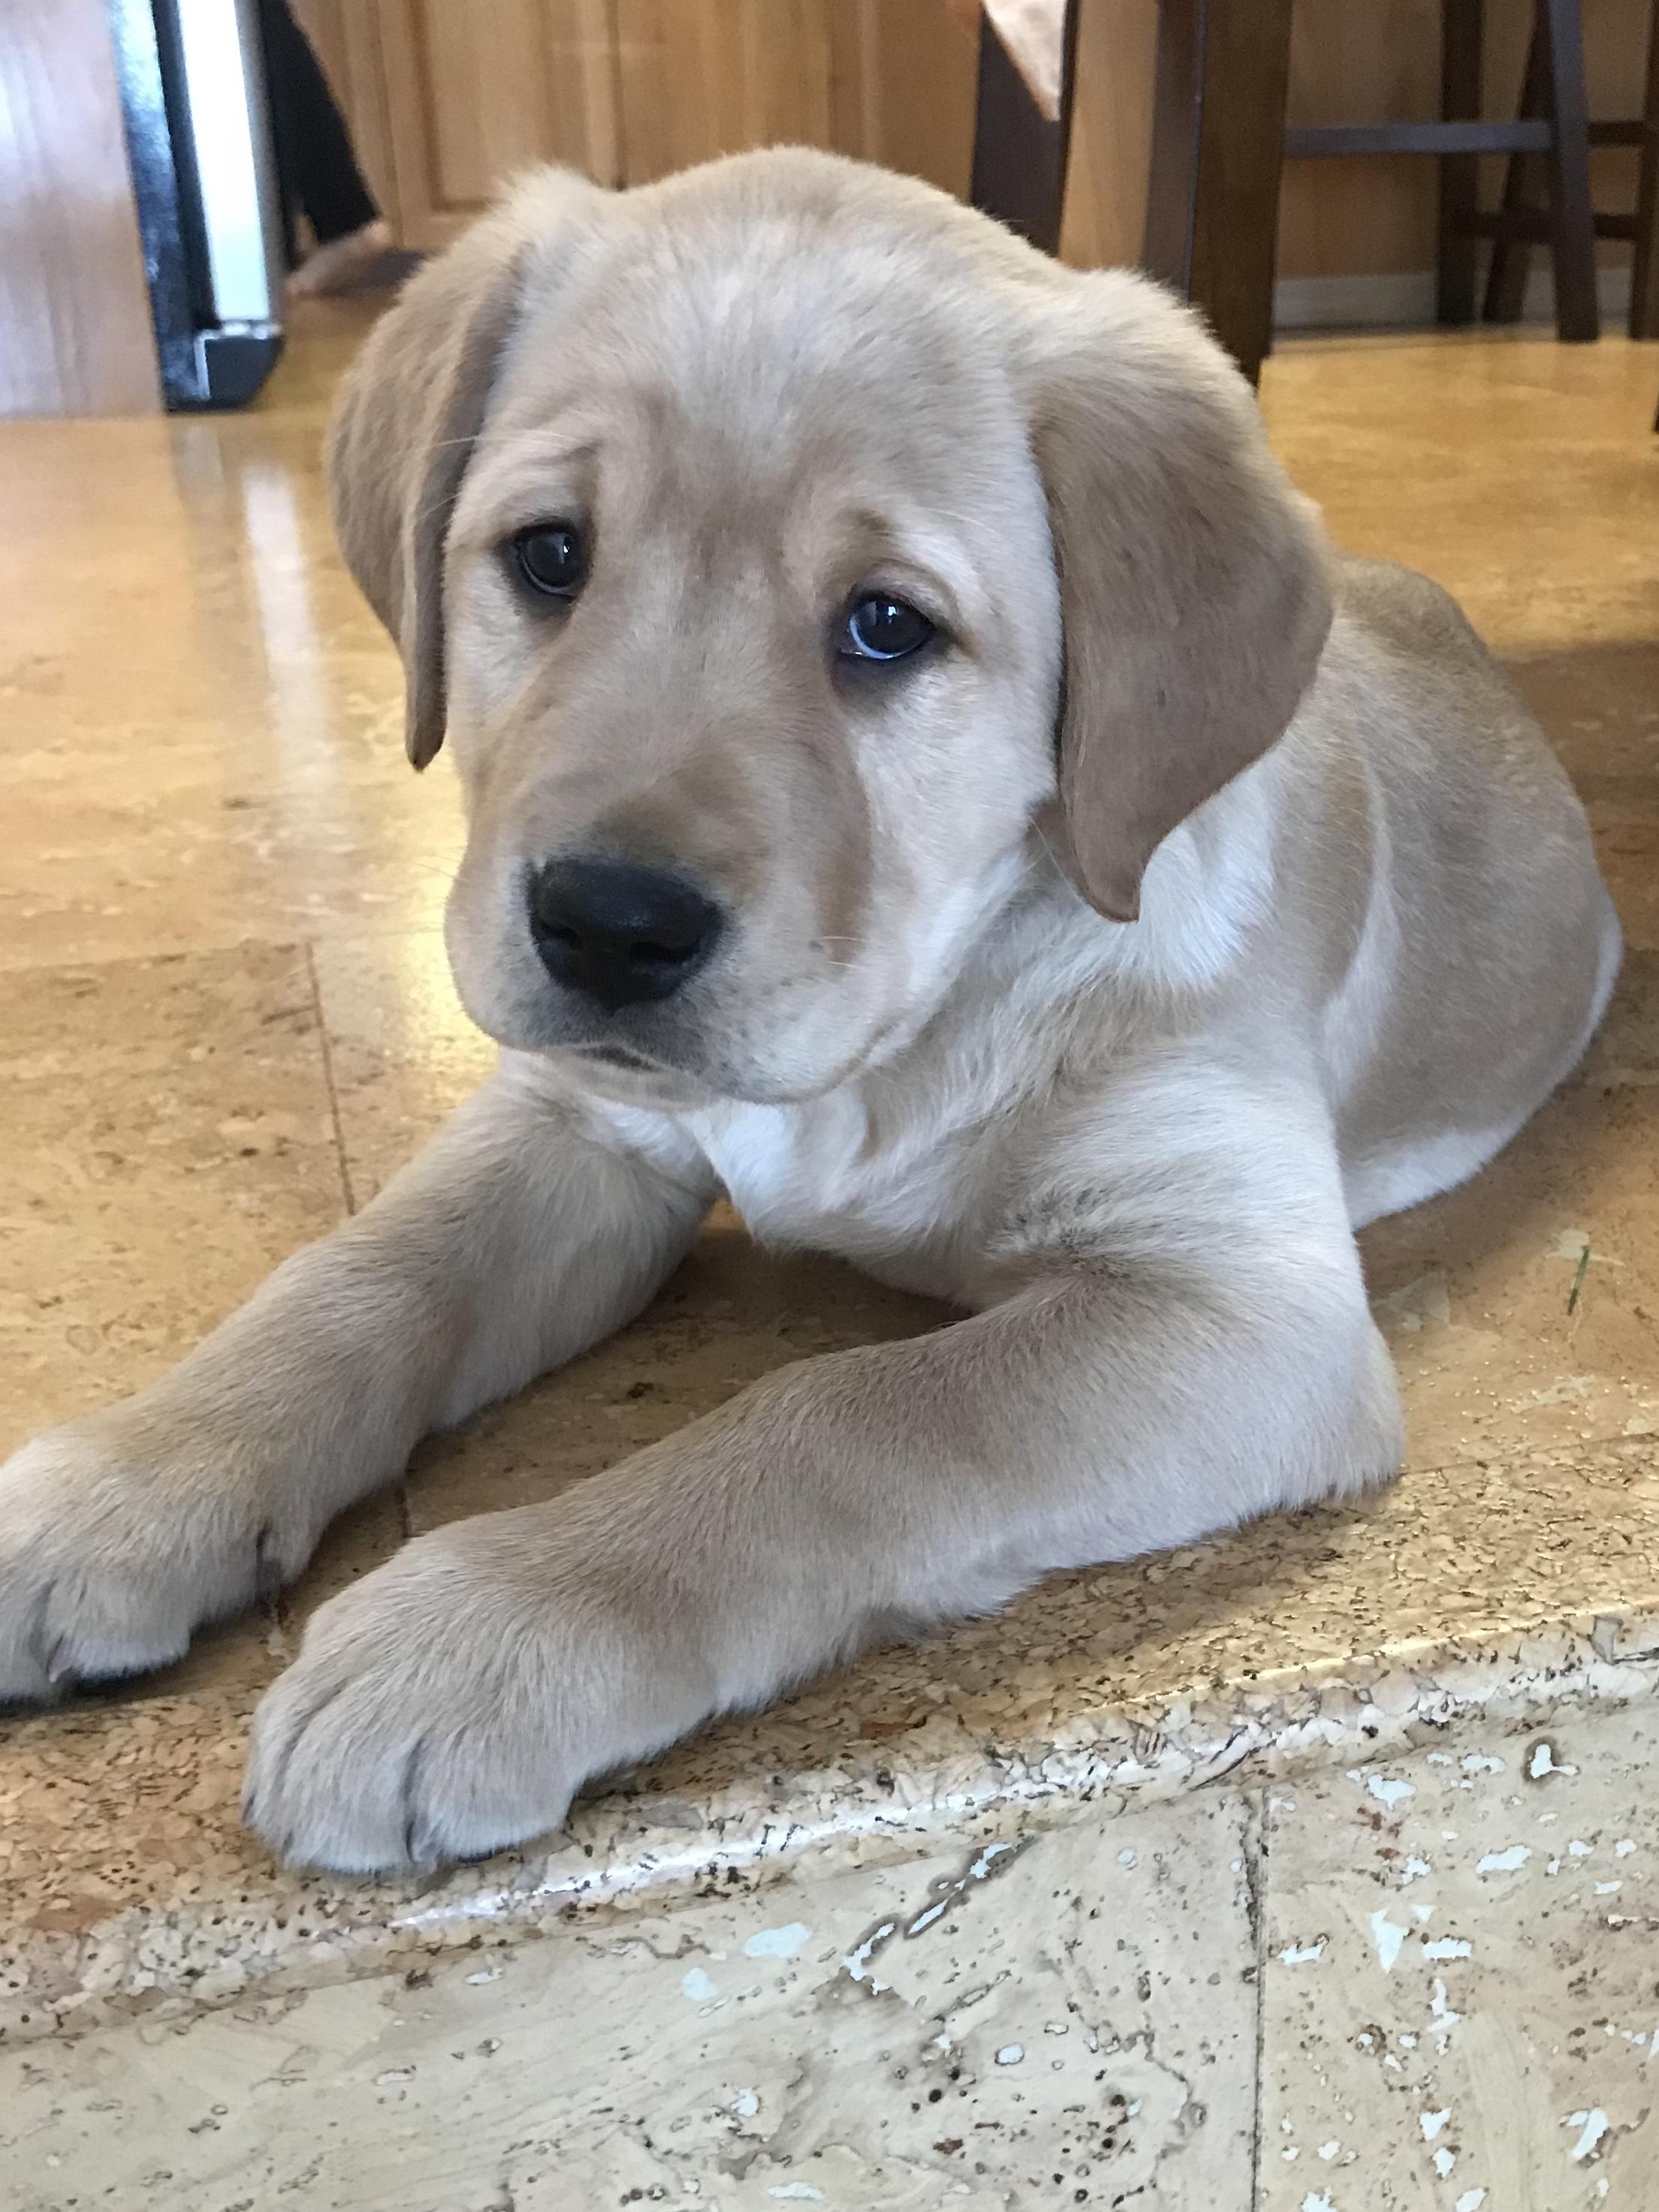 Eternally sad puppy - Album on Imgur